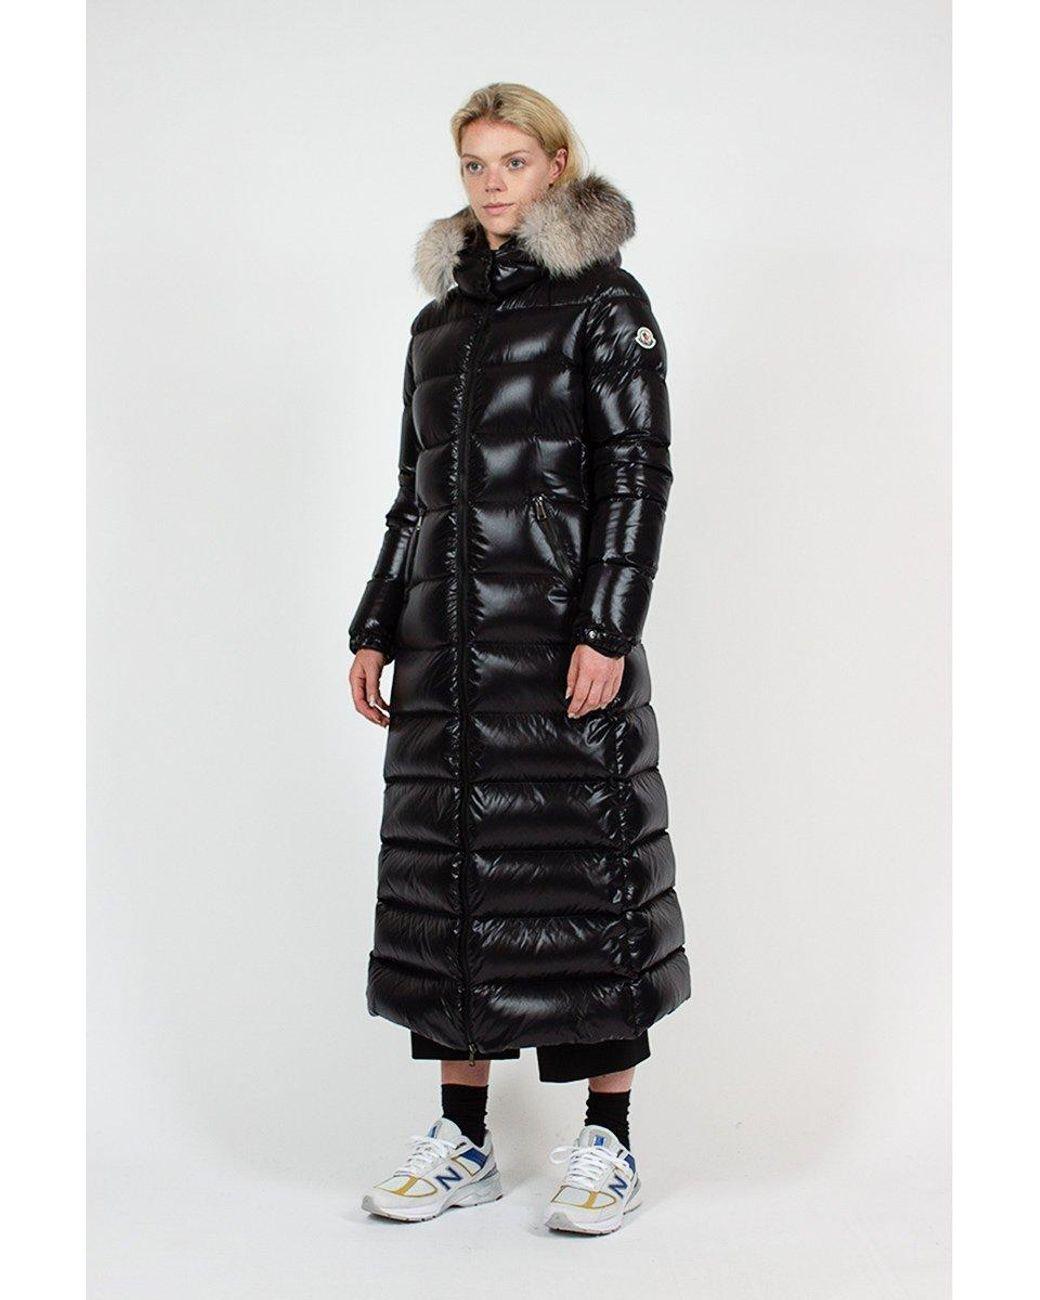 Moncler Goose Black Hudson Jacket Lyst Moncler Women Outerwear Women Puffer Jacket Women [ 1300 x 1040 Pixel ]